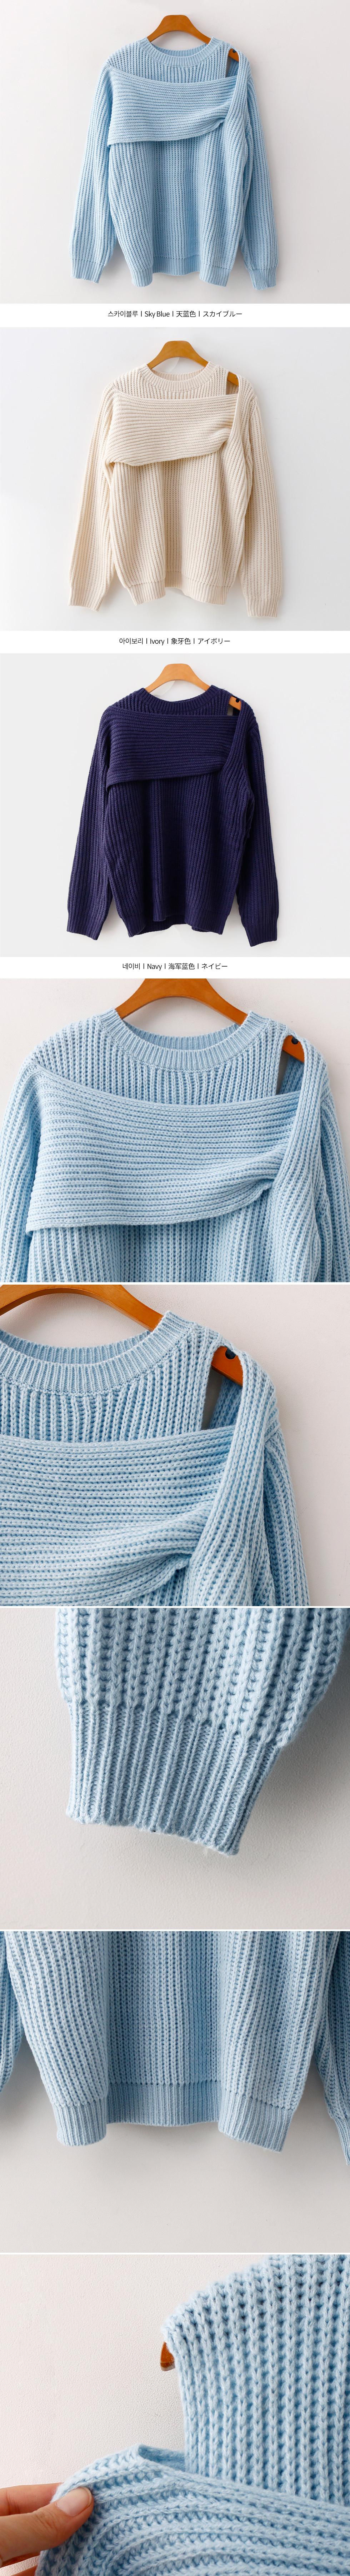 Less Shoulder Knitwear